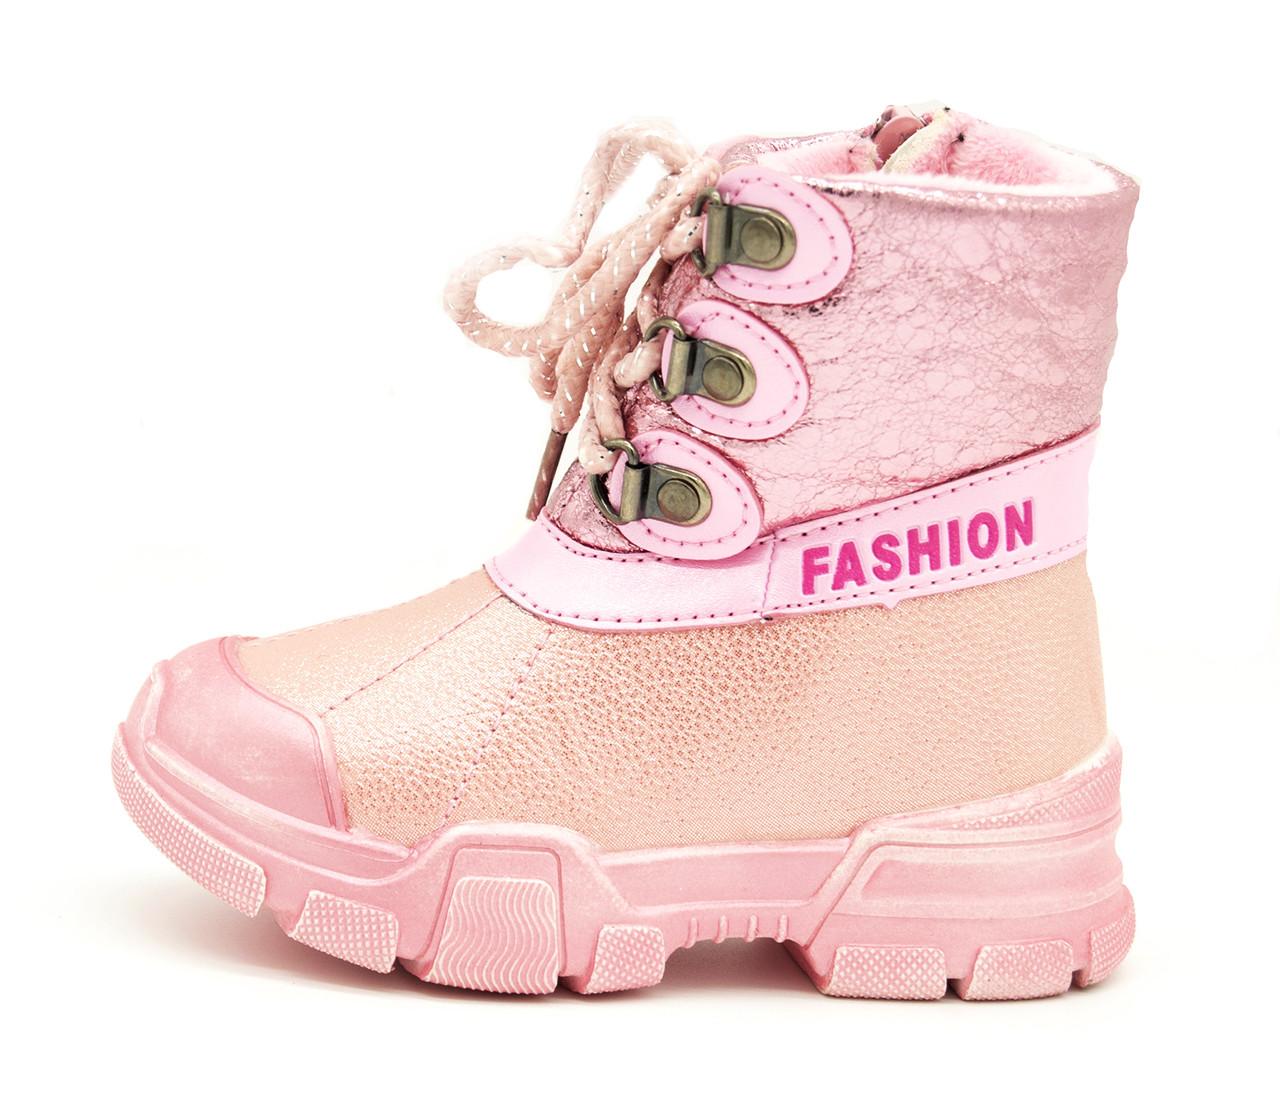 Ботинки Для девочек Розовый Размері: 24,25,26,27,28